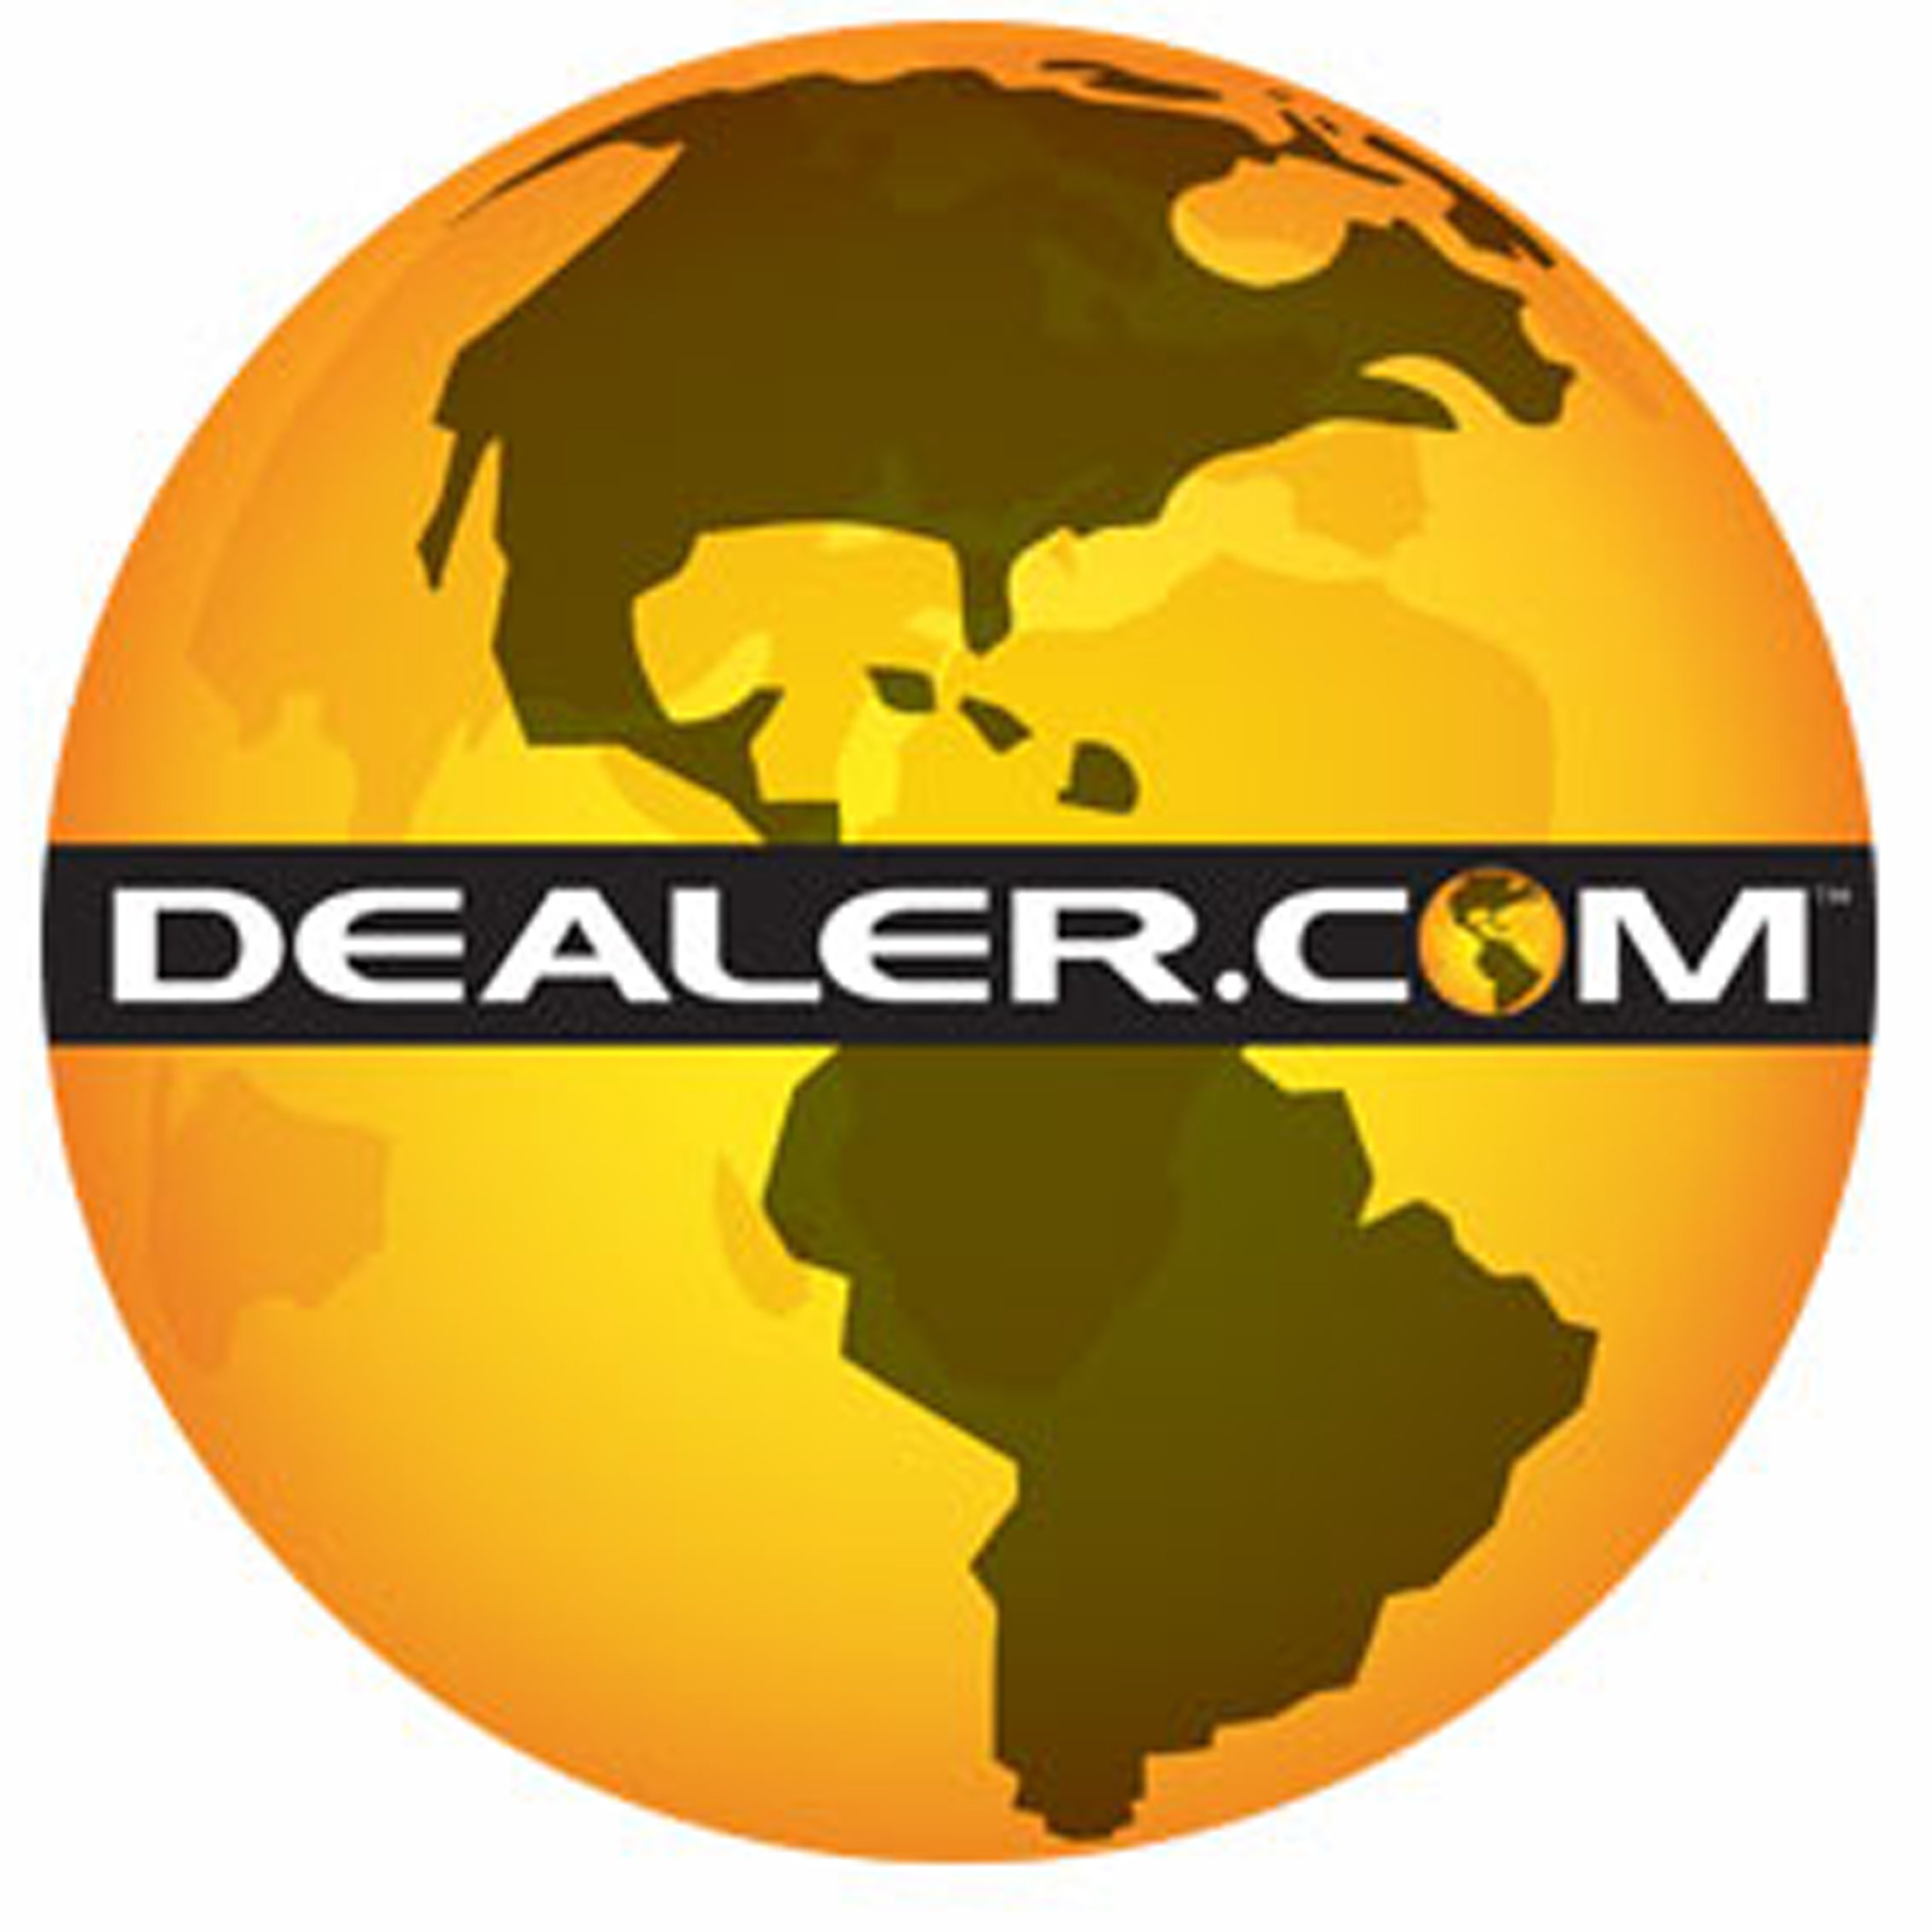 dealerLogo.jpg